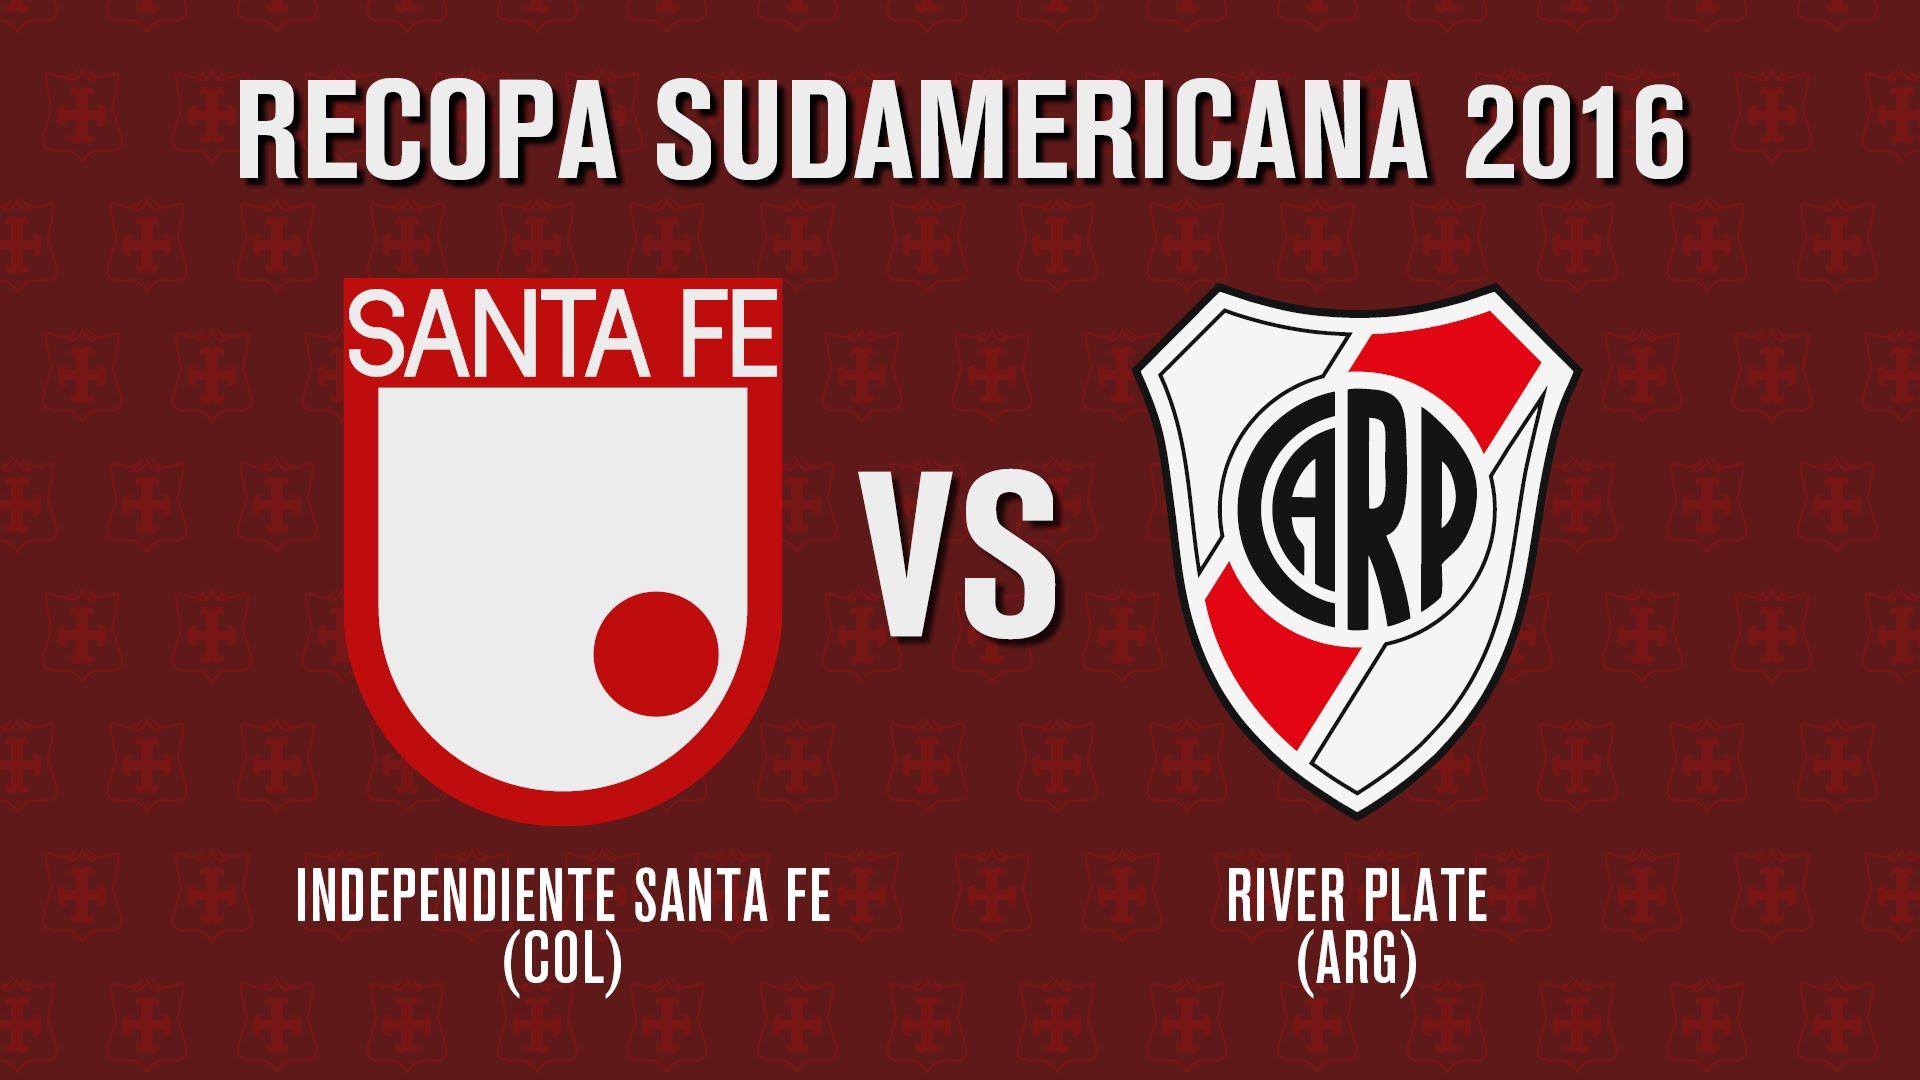 Finalizado: I.Santa Fe 0-0 River Plate